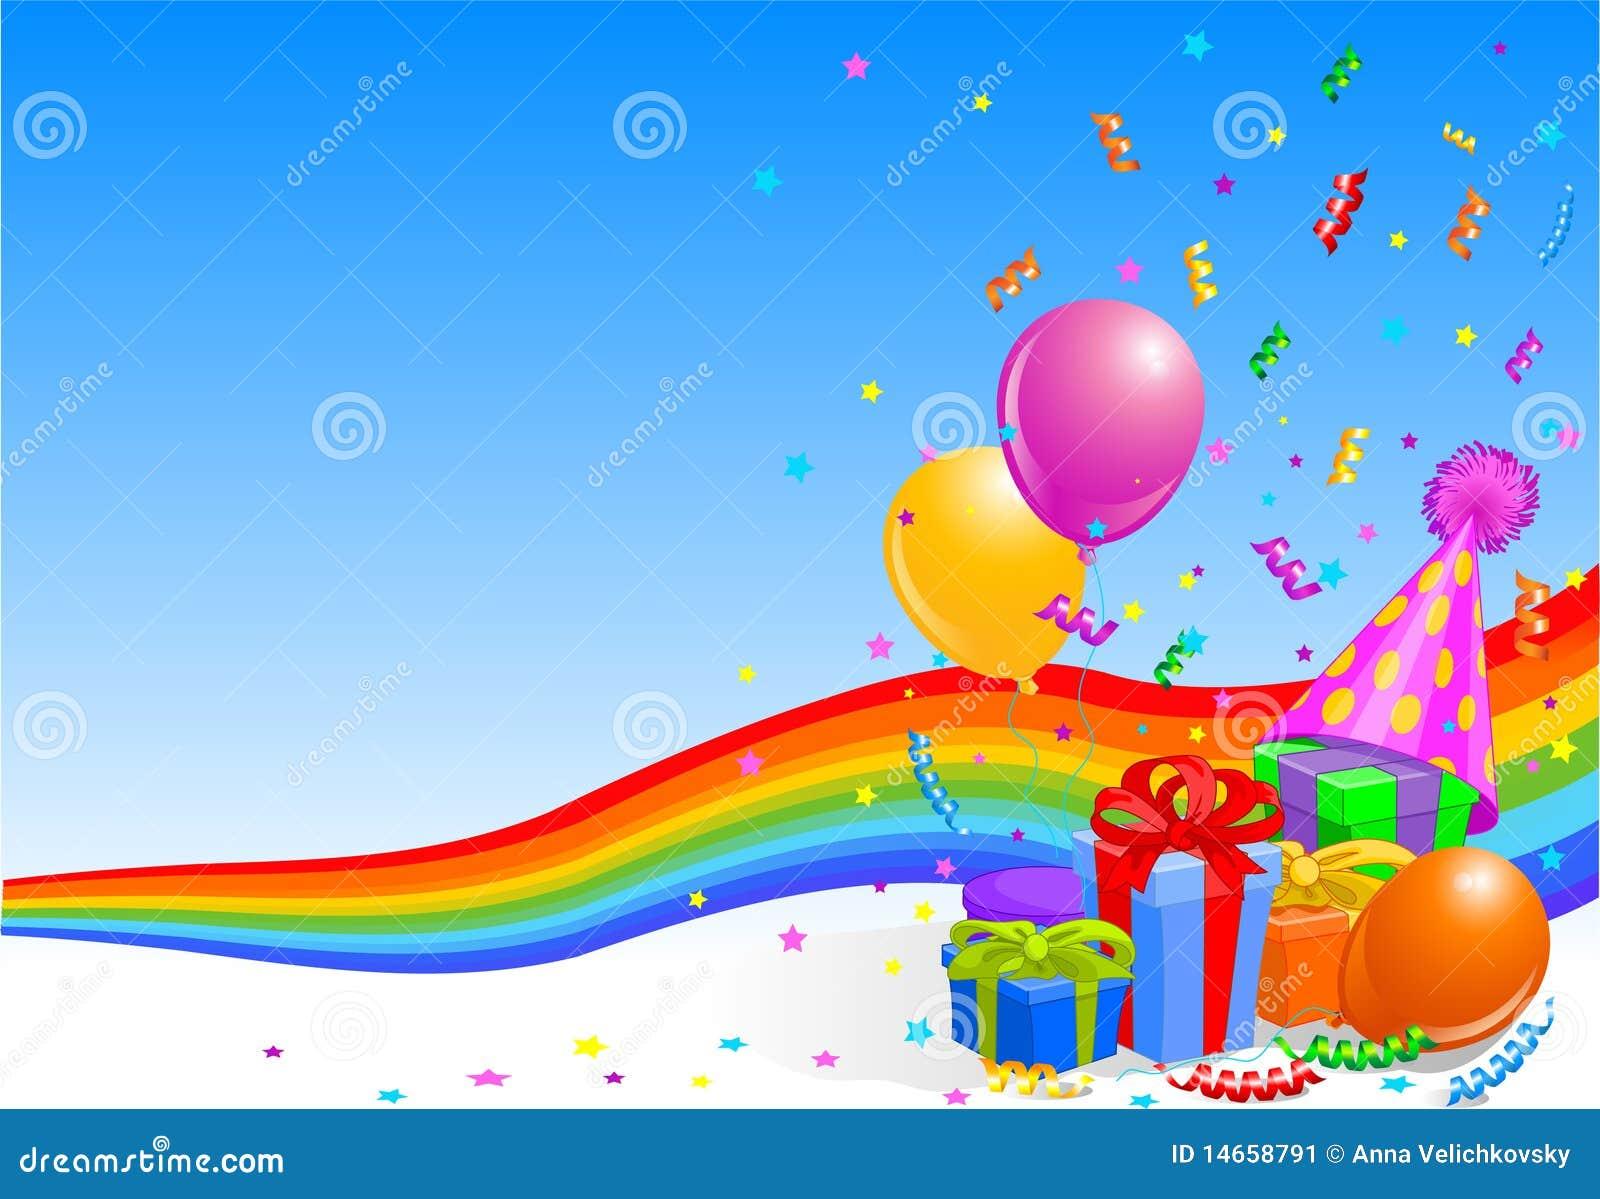 Birthday Party Background Stock Image - Image: 14658791